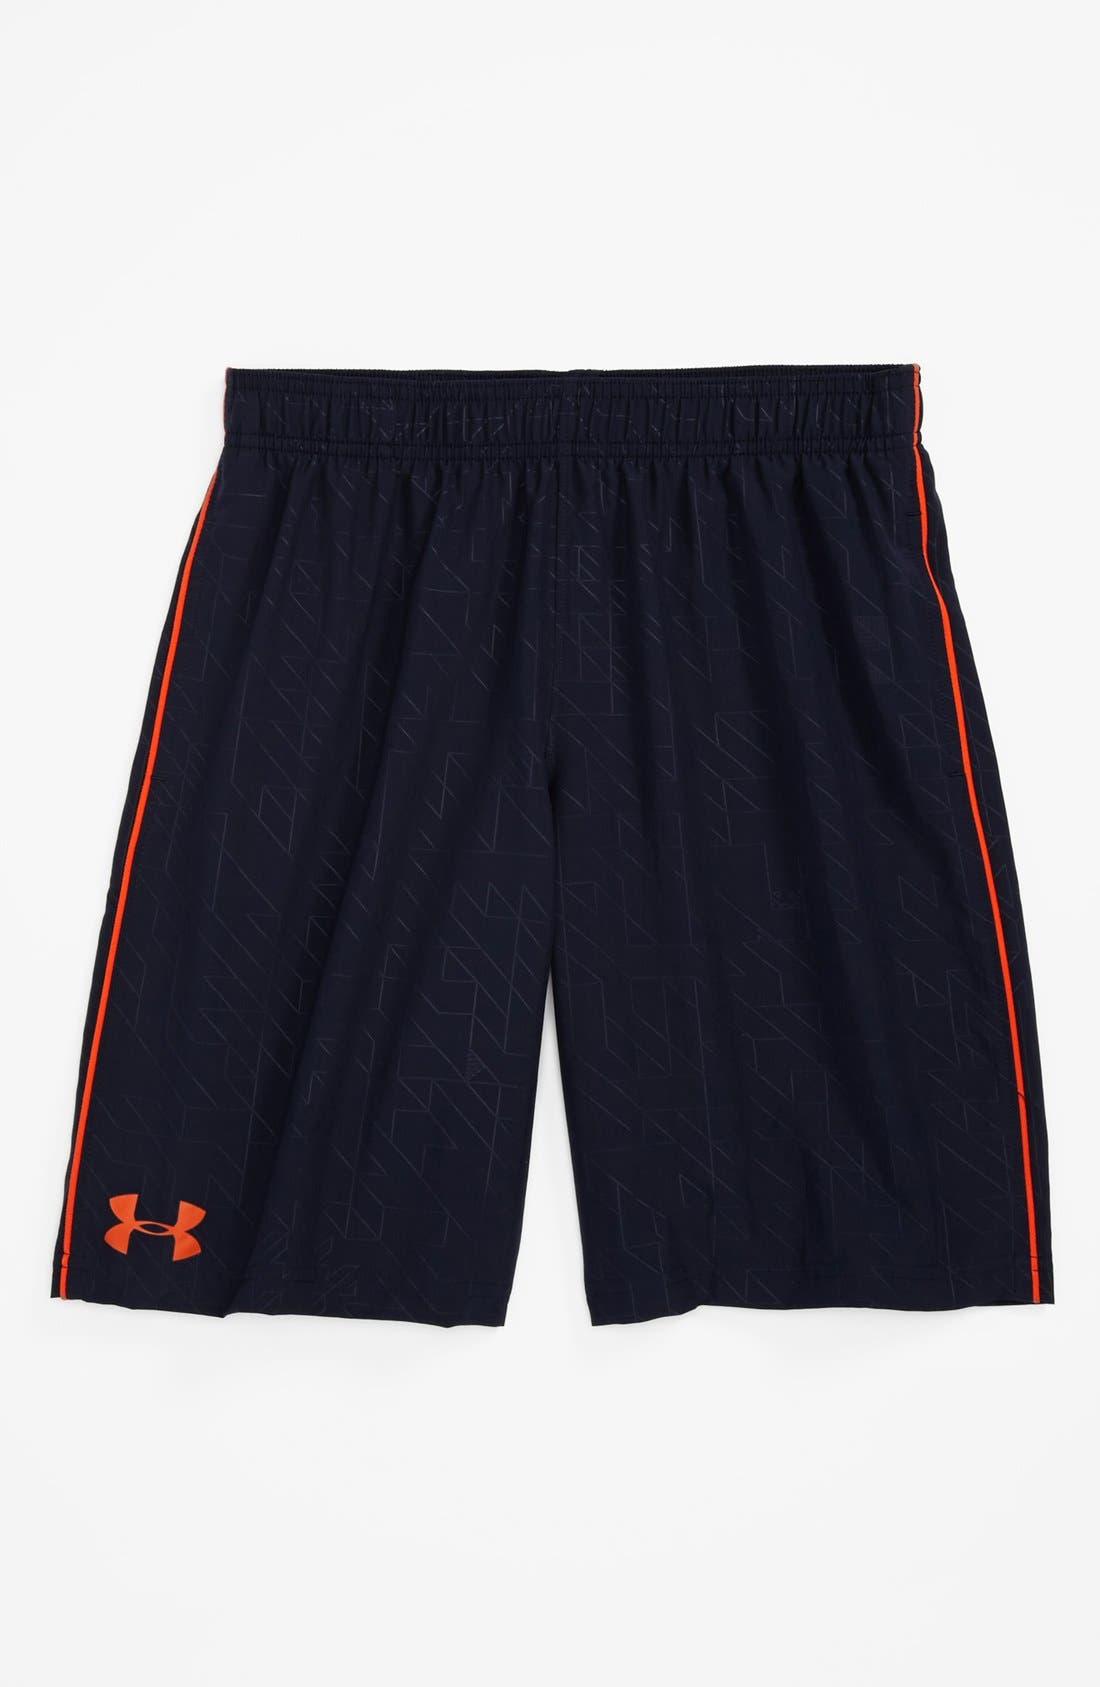 Main Image - Under Armour 'Ultimate' HeatGear® Shorts (Big Boys)